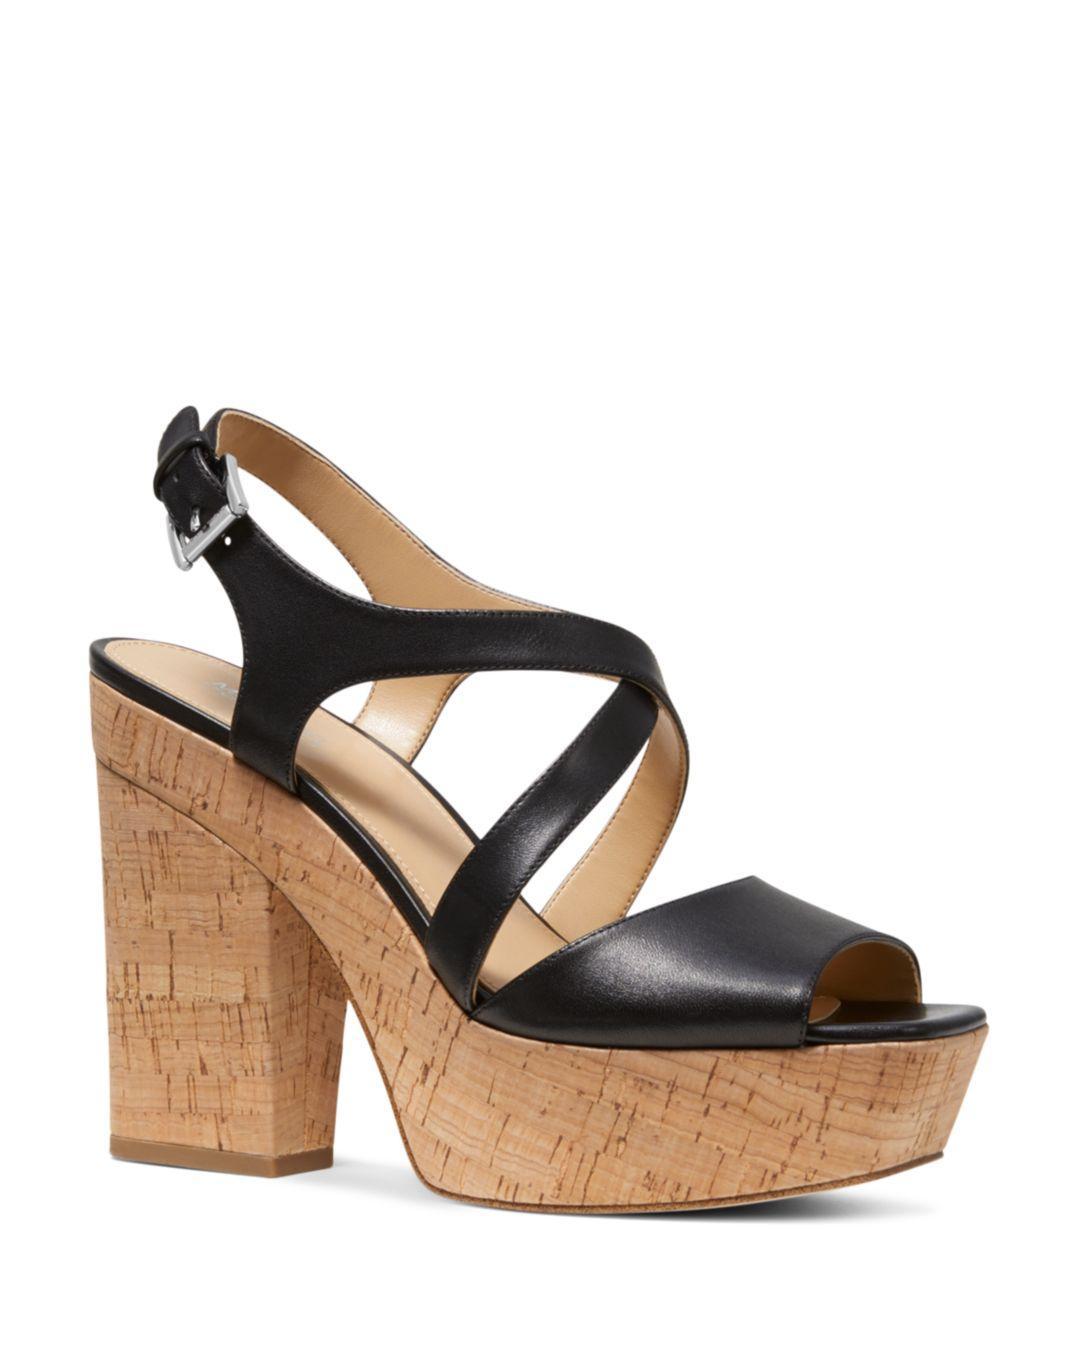 7eafb63dcd6 MICHAEL Michael Kors. Black Women s Abbott Leather Platform Wedge Sandals